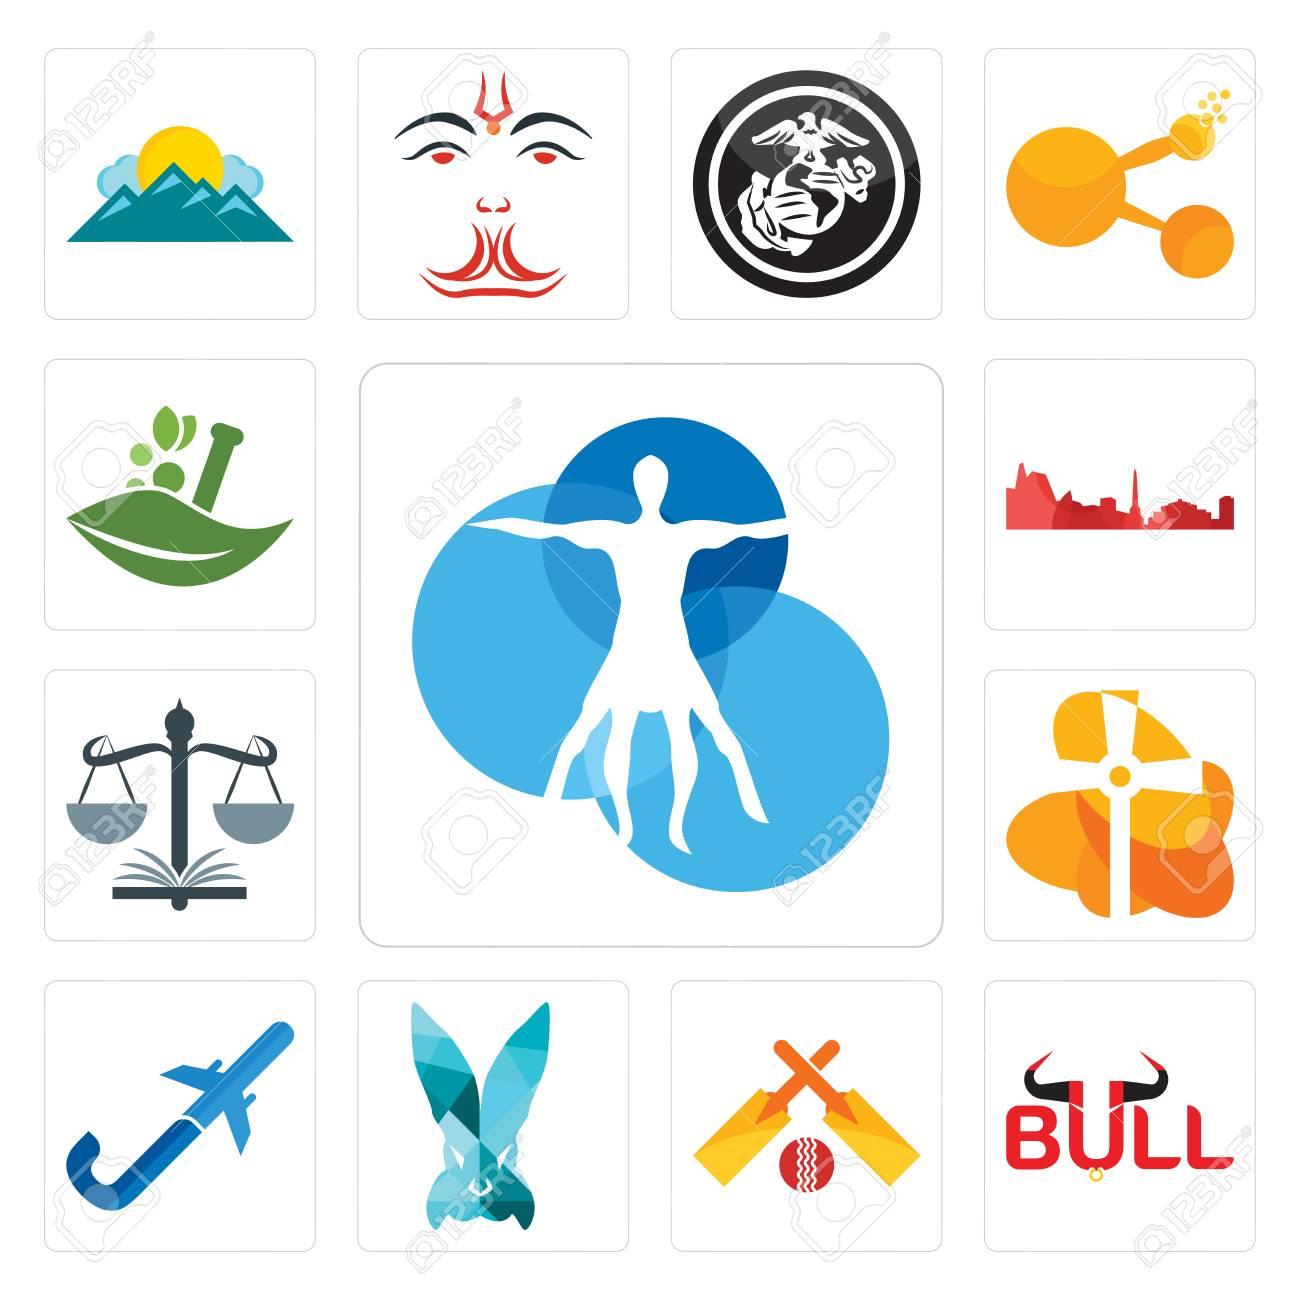 Set Of 13 Simple Editable Icons Such As Vitruvian Man Bull